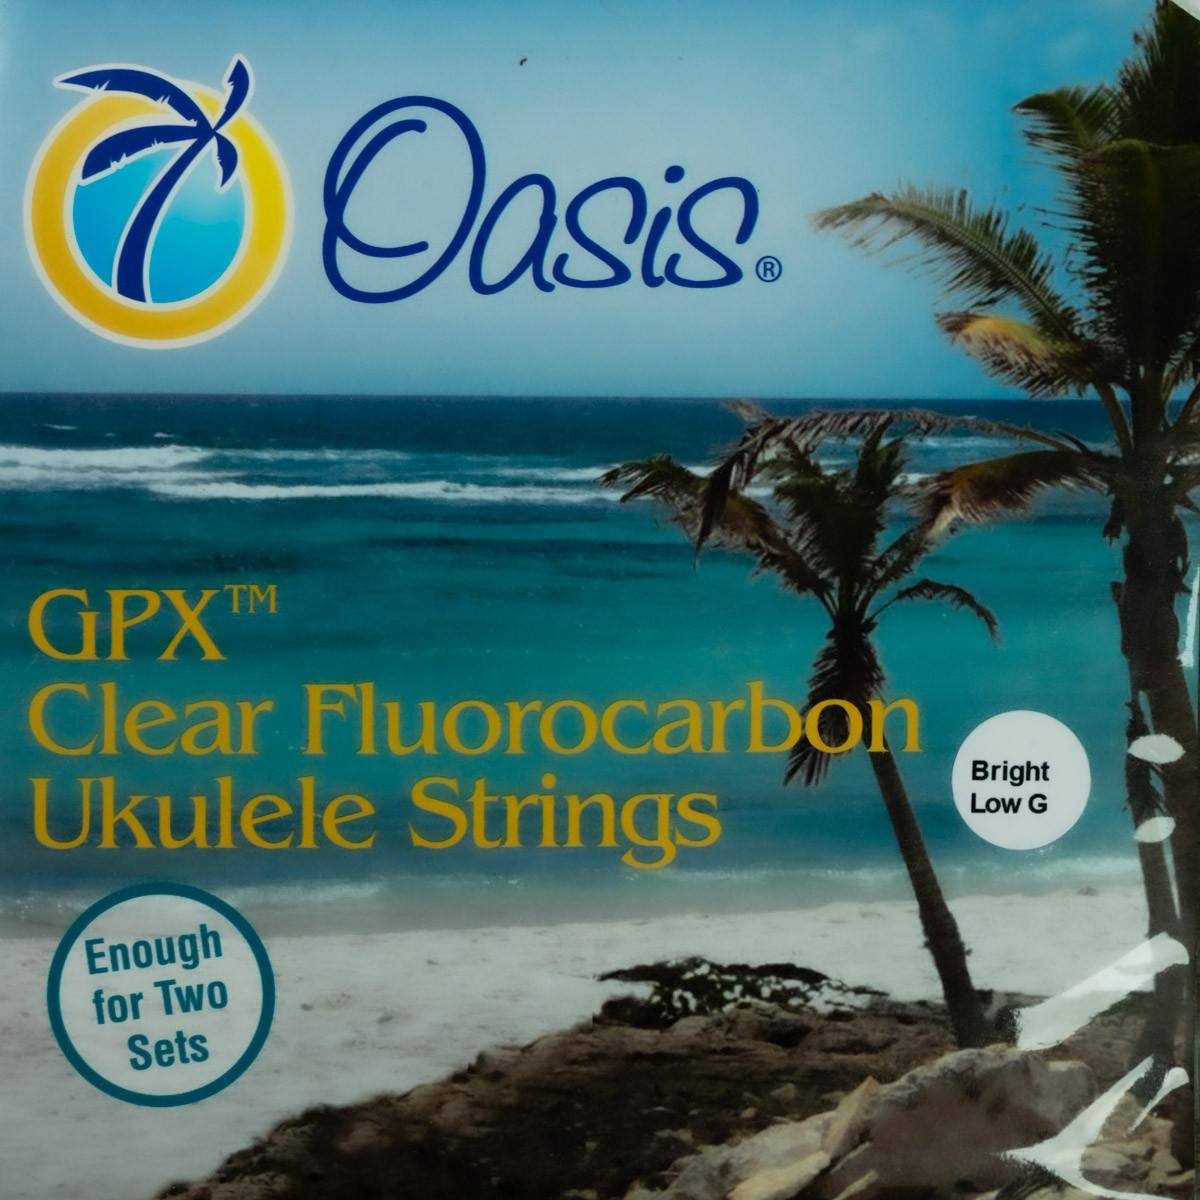 Oasis Fluorocarbon Strings (UKE 8001 Bright Low G)